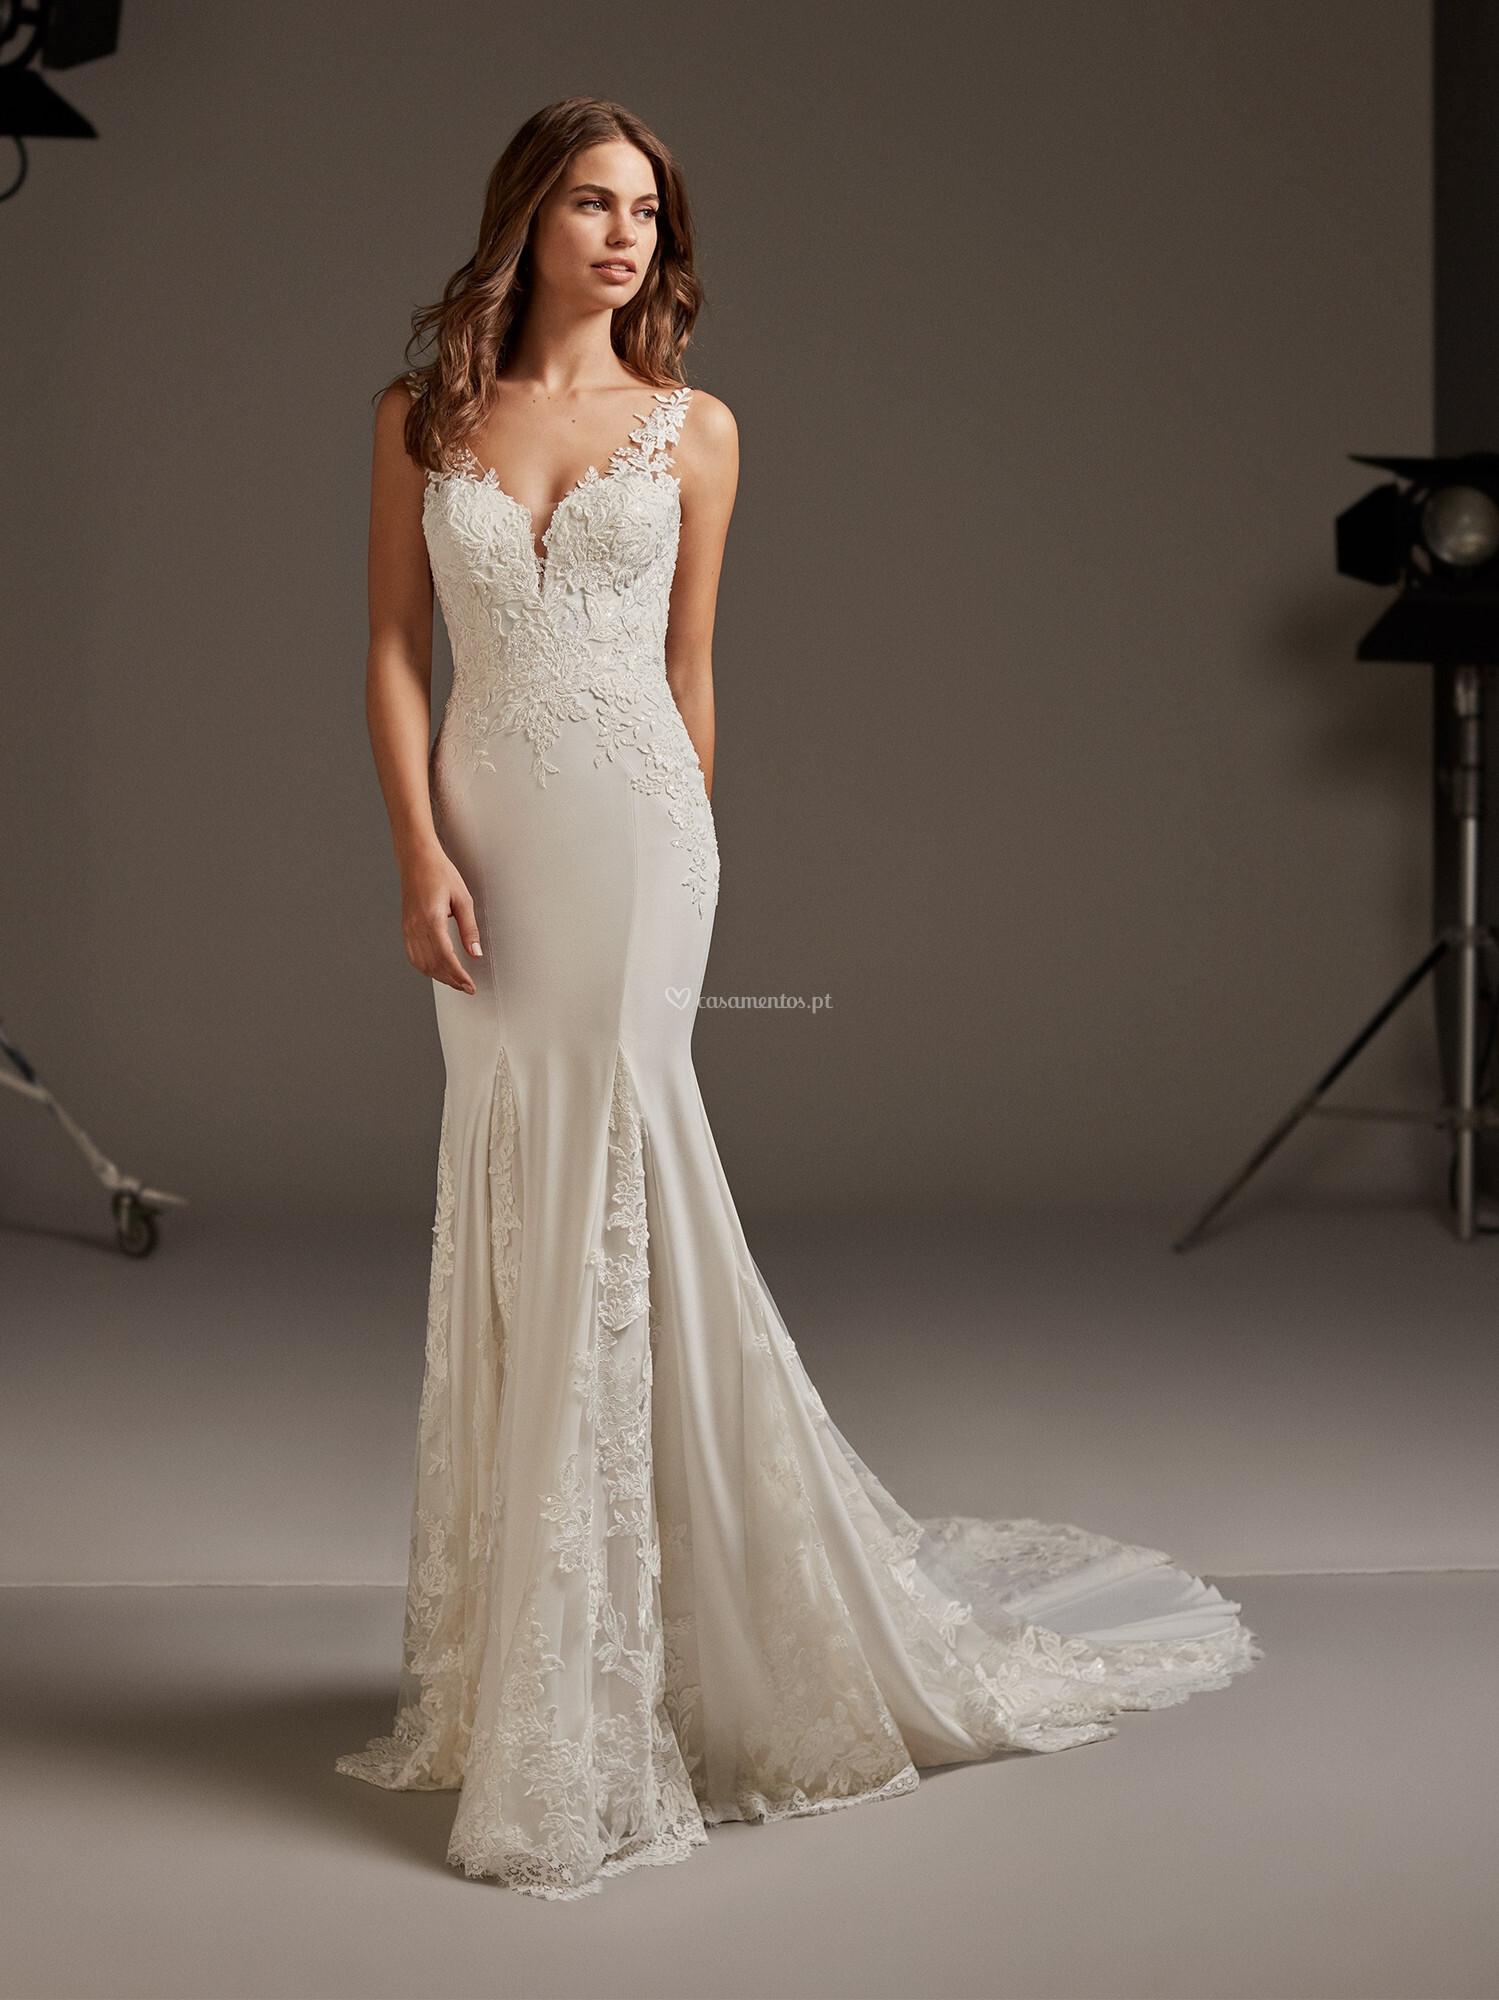 Vestido sereia: Like ou Dislike? 1